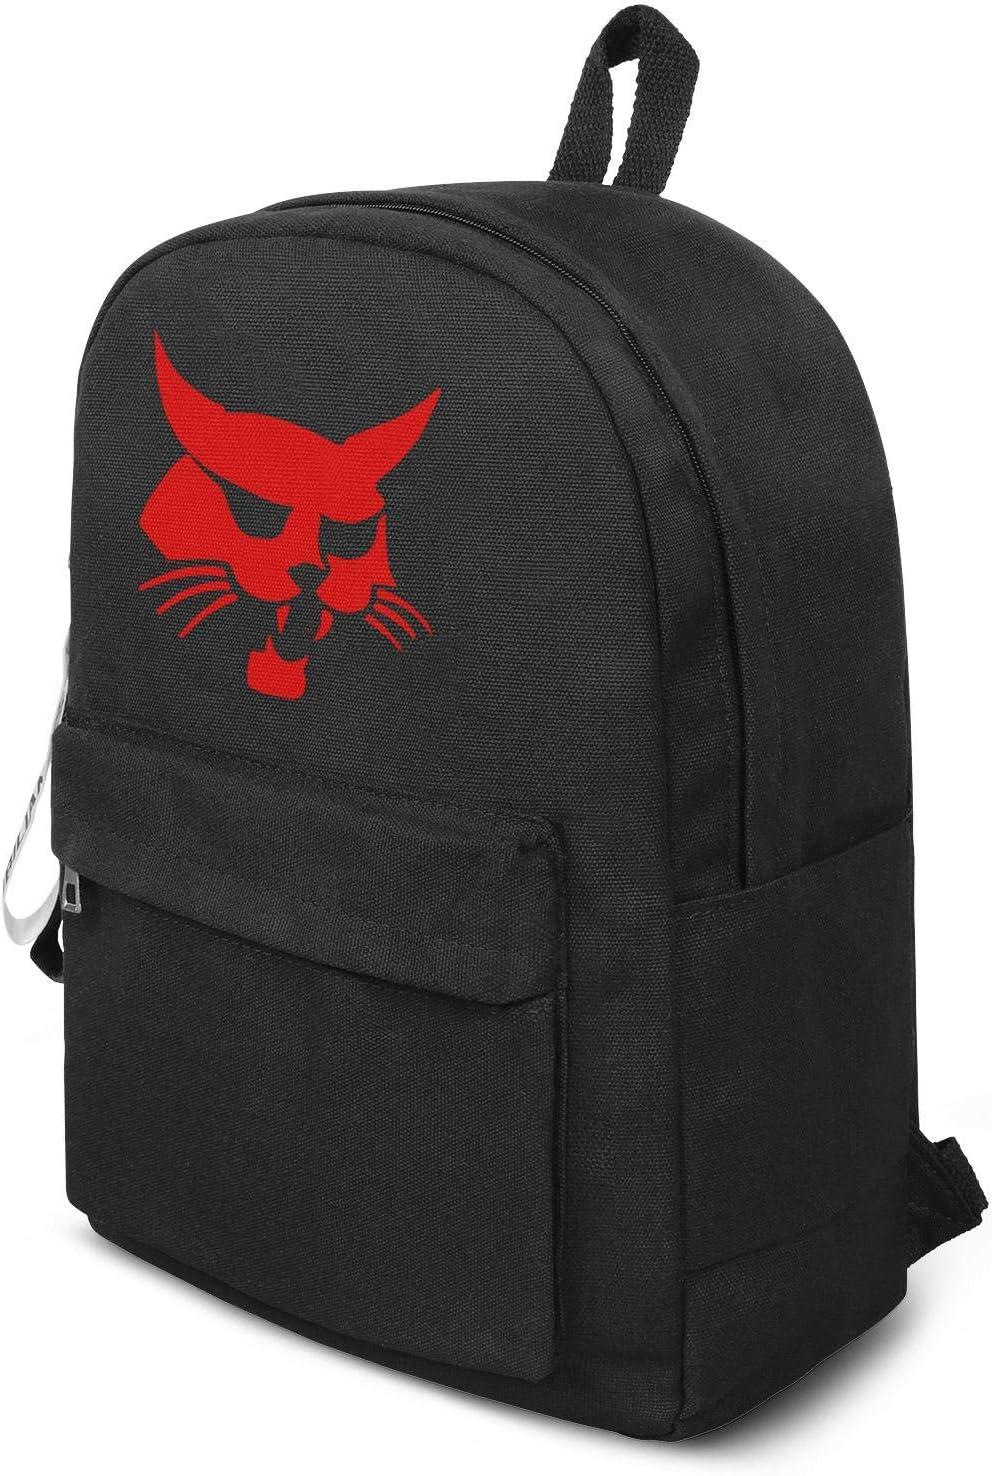 Canvas Essential Everyday Work Large Tote Bag Custom Tote Bag for WomenBrisbane-Marine-logo-blackheat